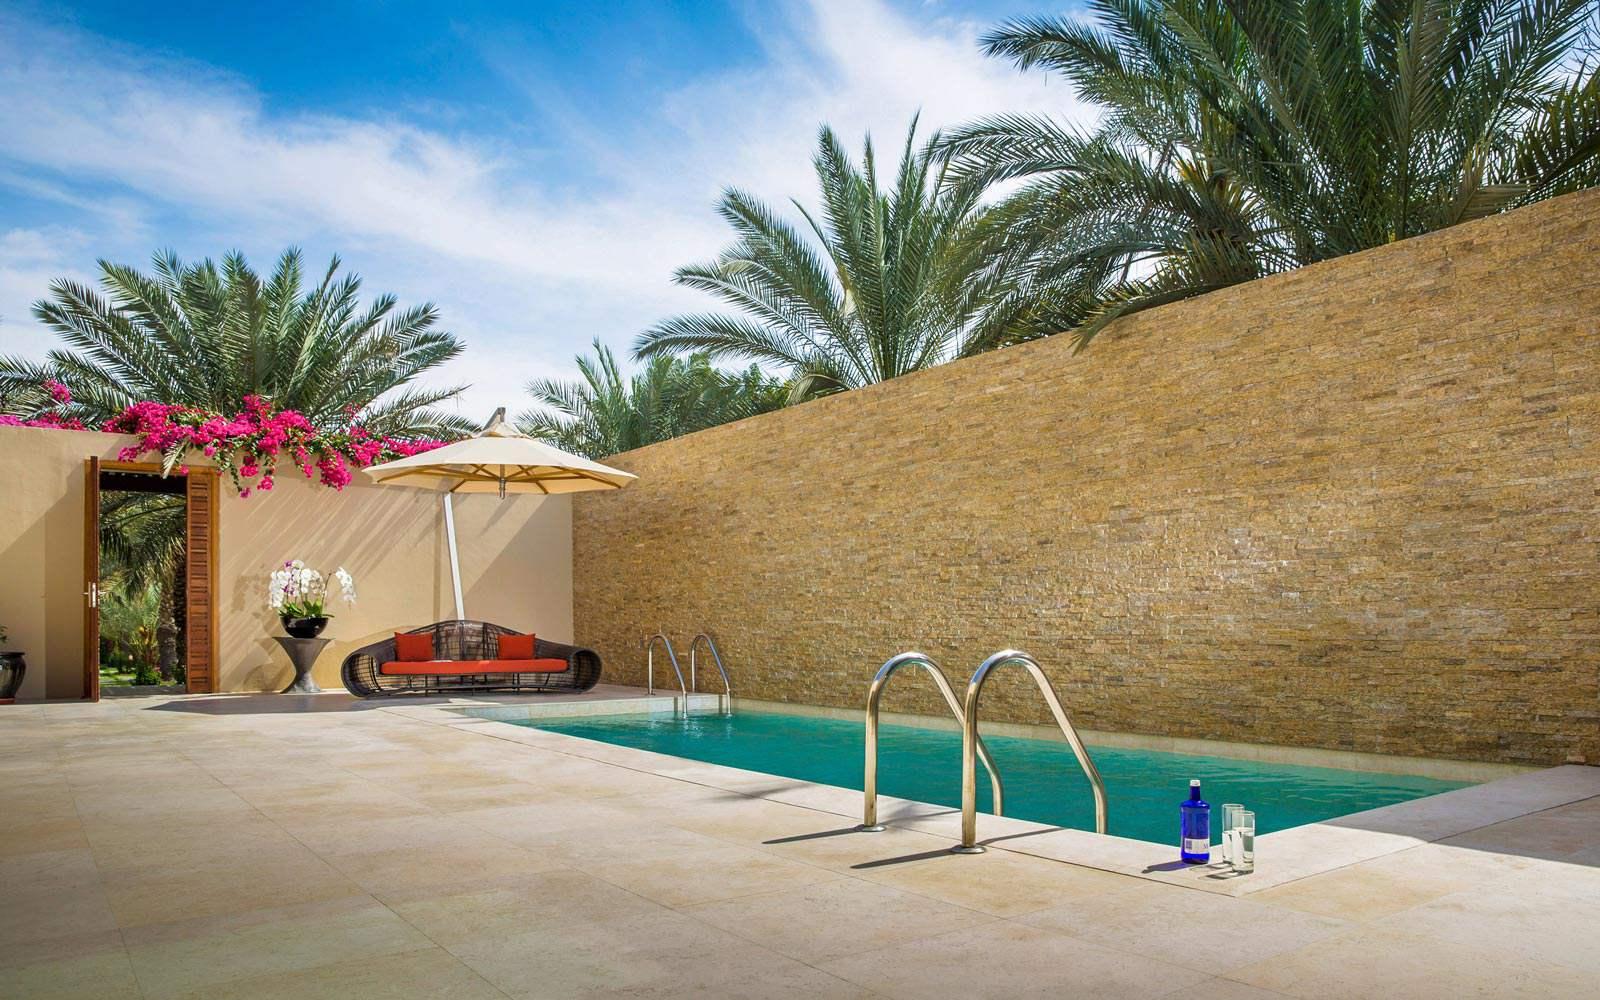 Melia Desert Palm Pool Villa